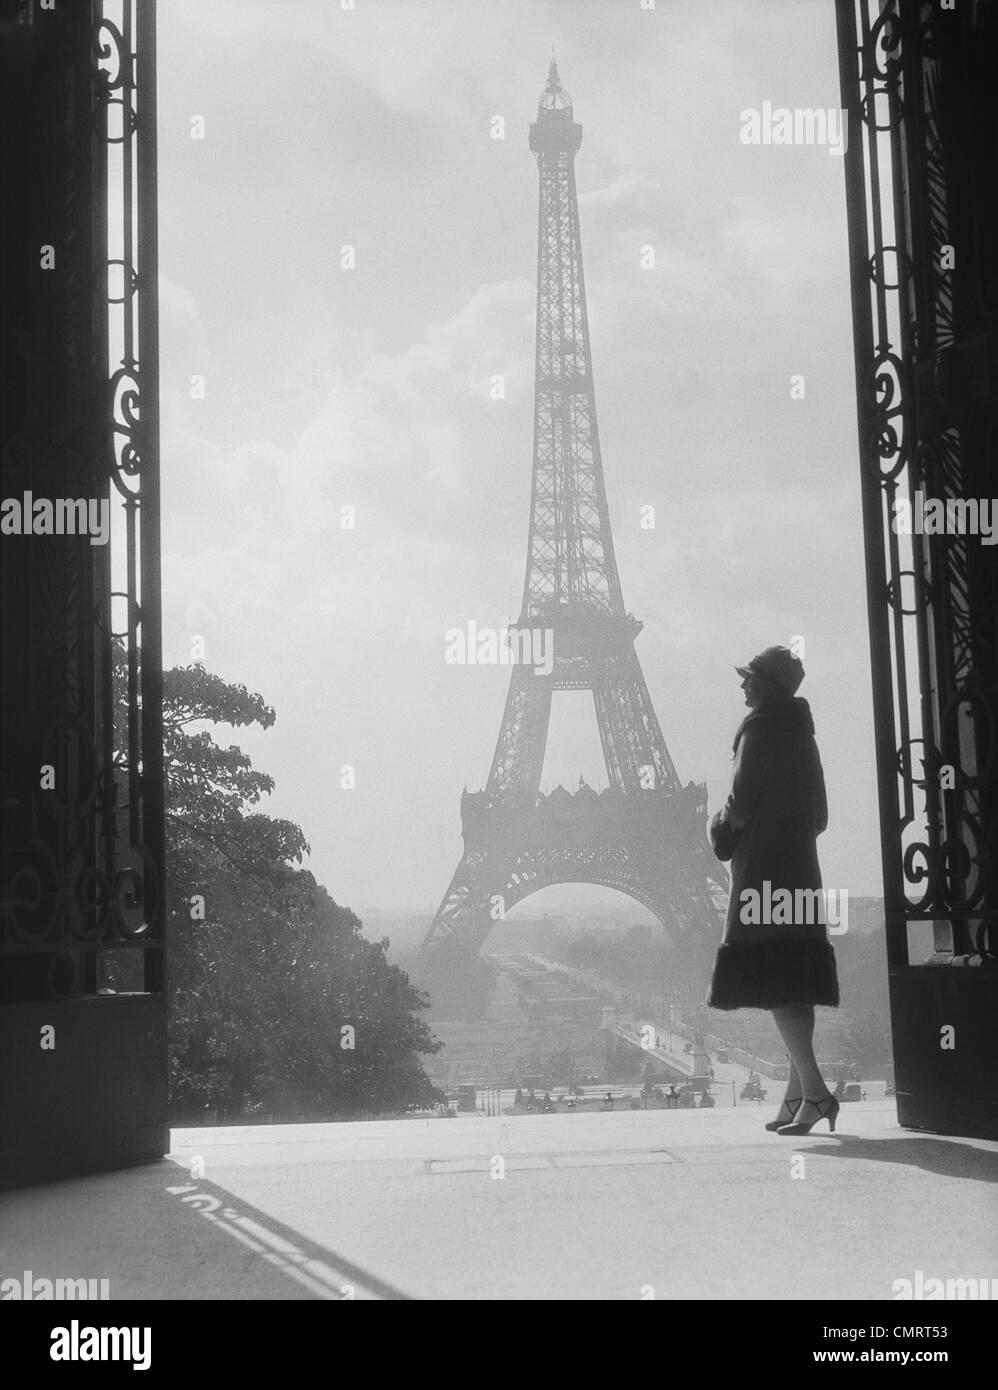 1920S 1930S SILHOUETTE MOODY FRAU PARIS STEHEND IM TROCADERO MIT BLICK AUF EIFFELTURM Stockbild